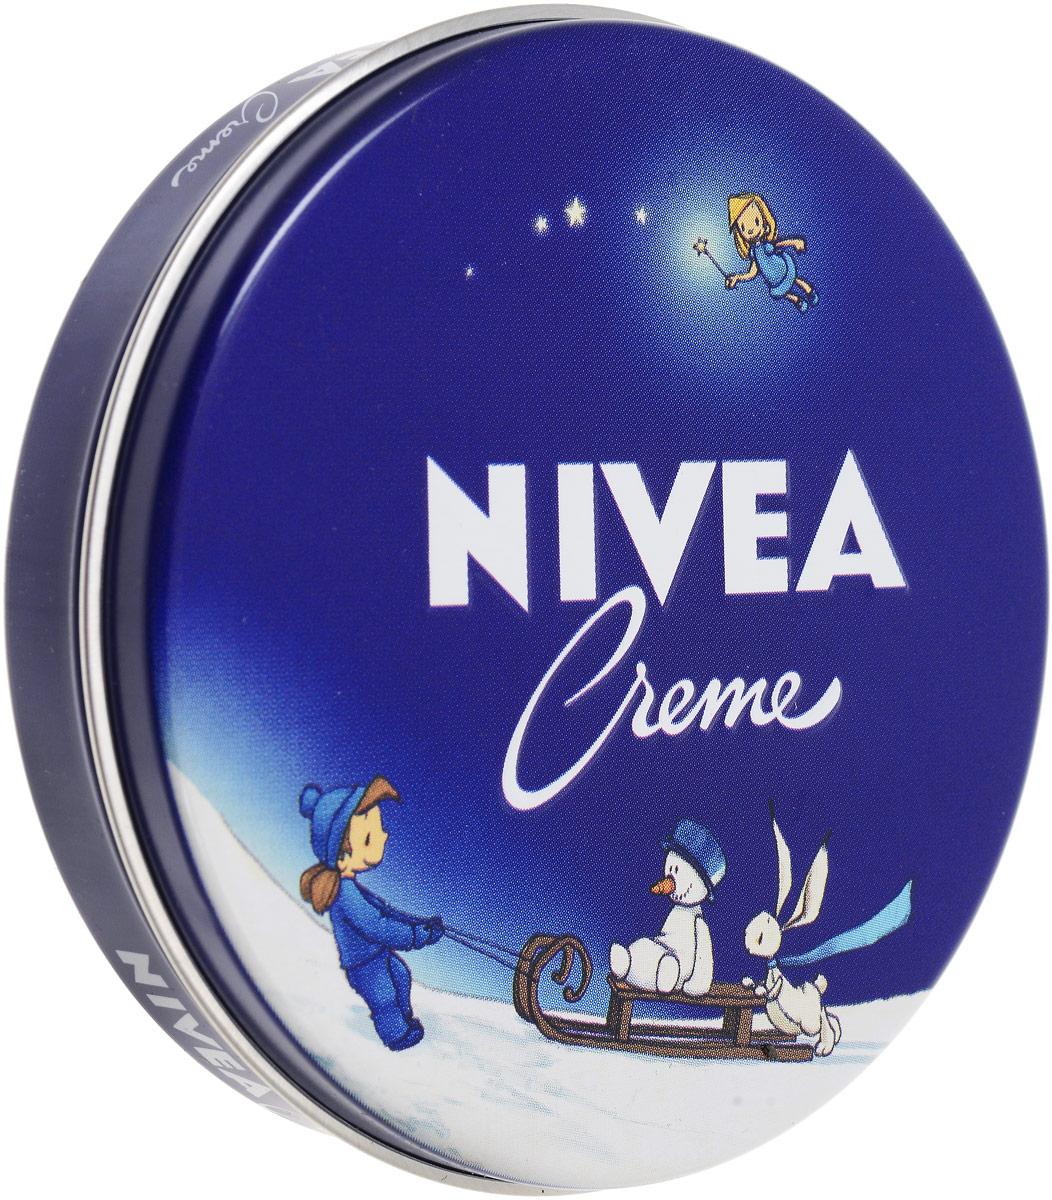 NIVEA Крем для ухода за кожей 75 мл acorelle крем замедляющий рост волос для тела французский трюфель флакон 75 мл acorelle